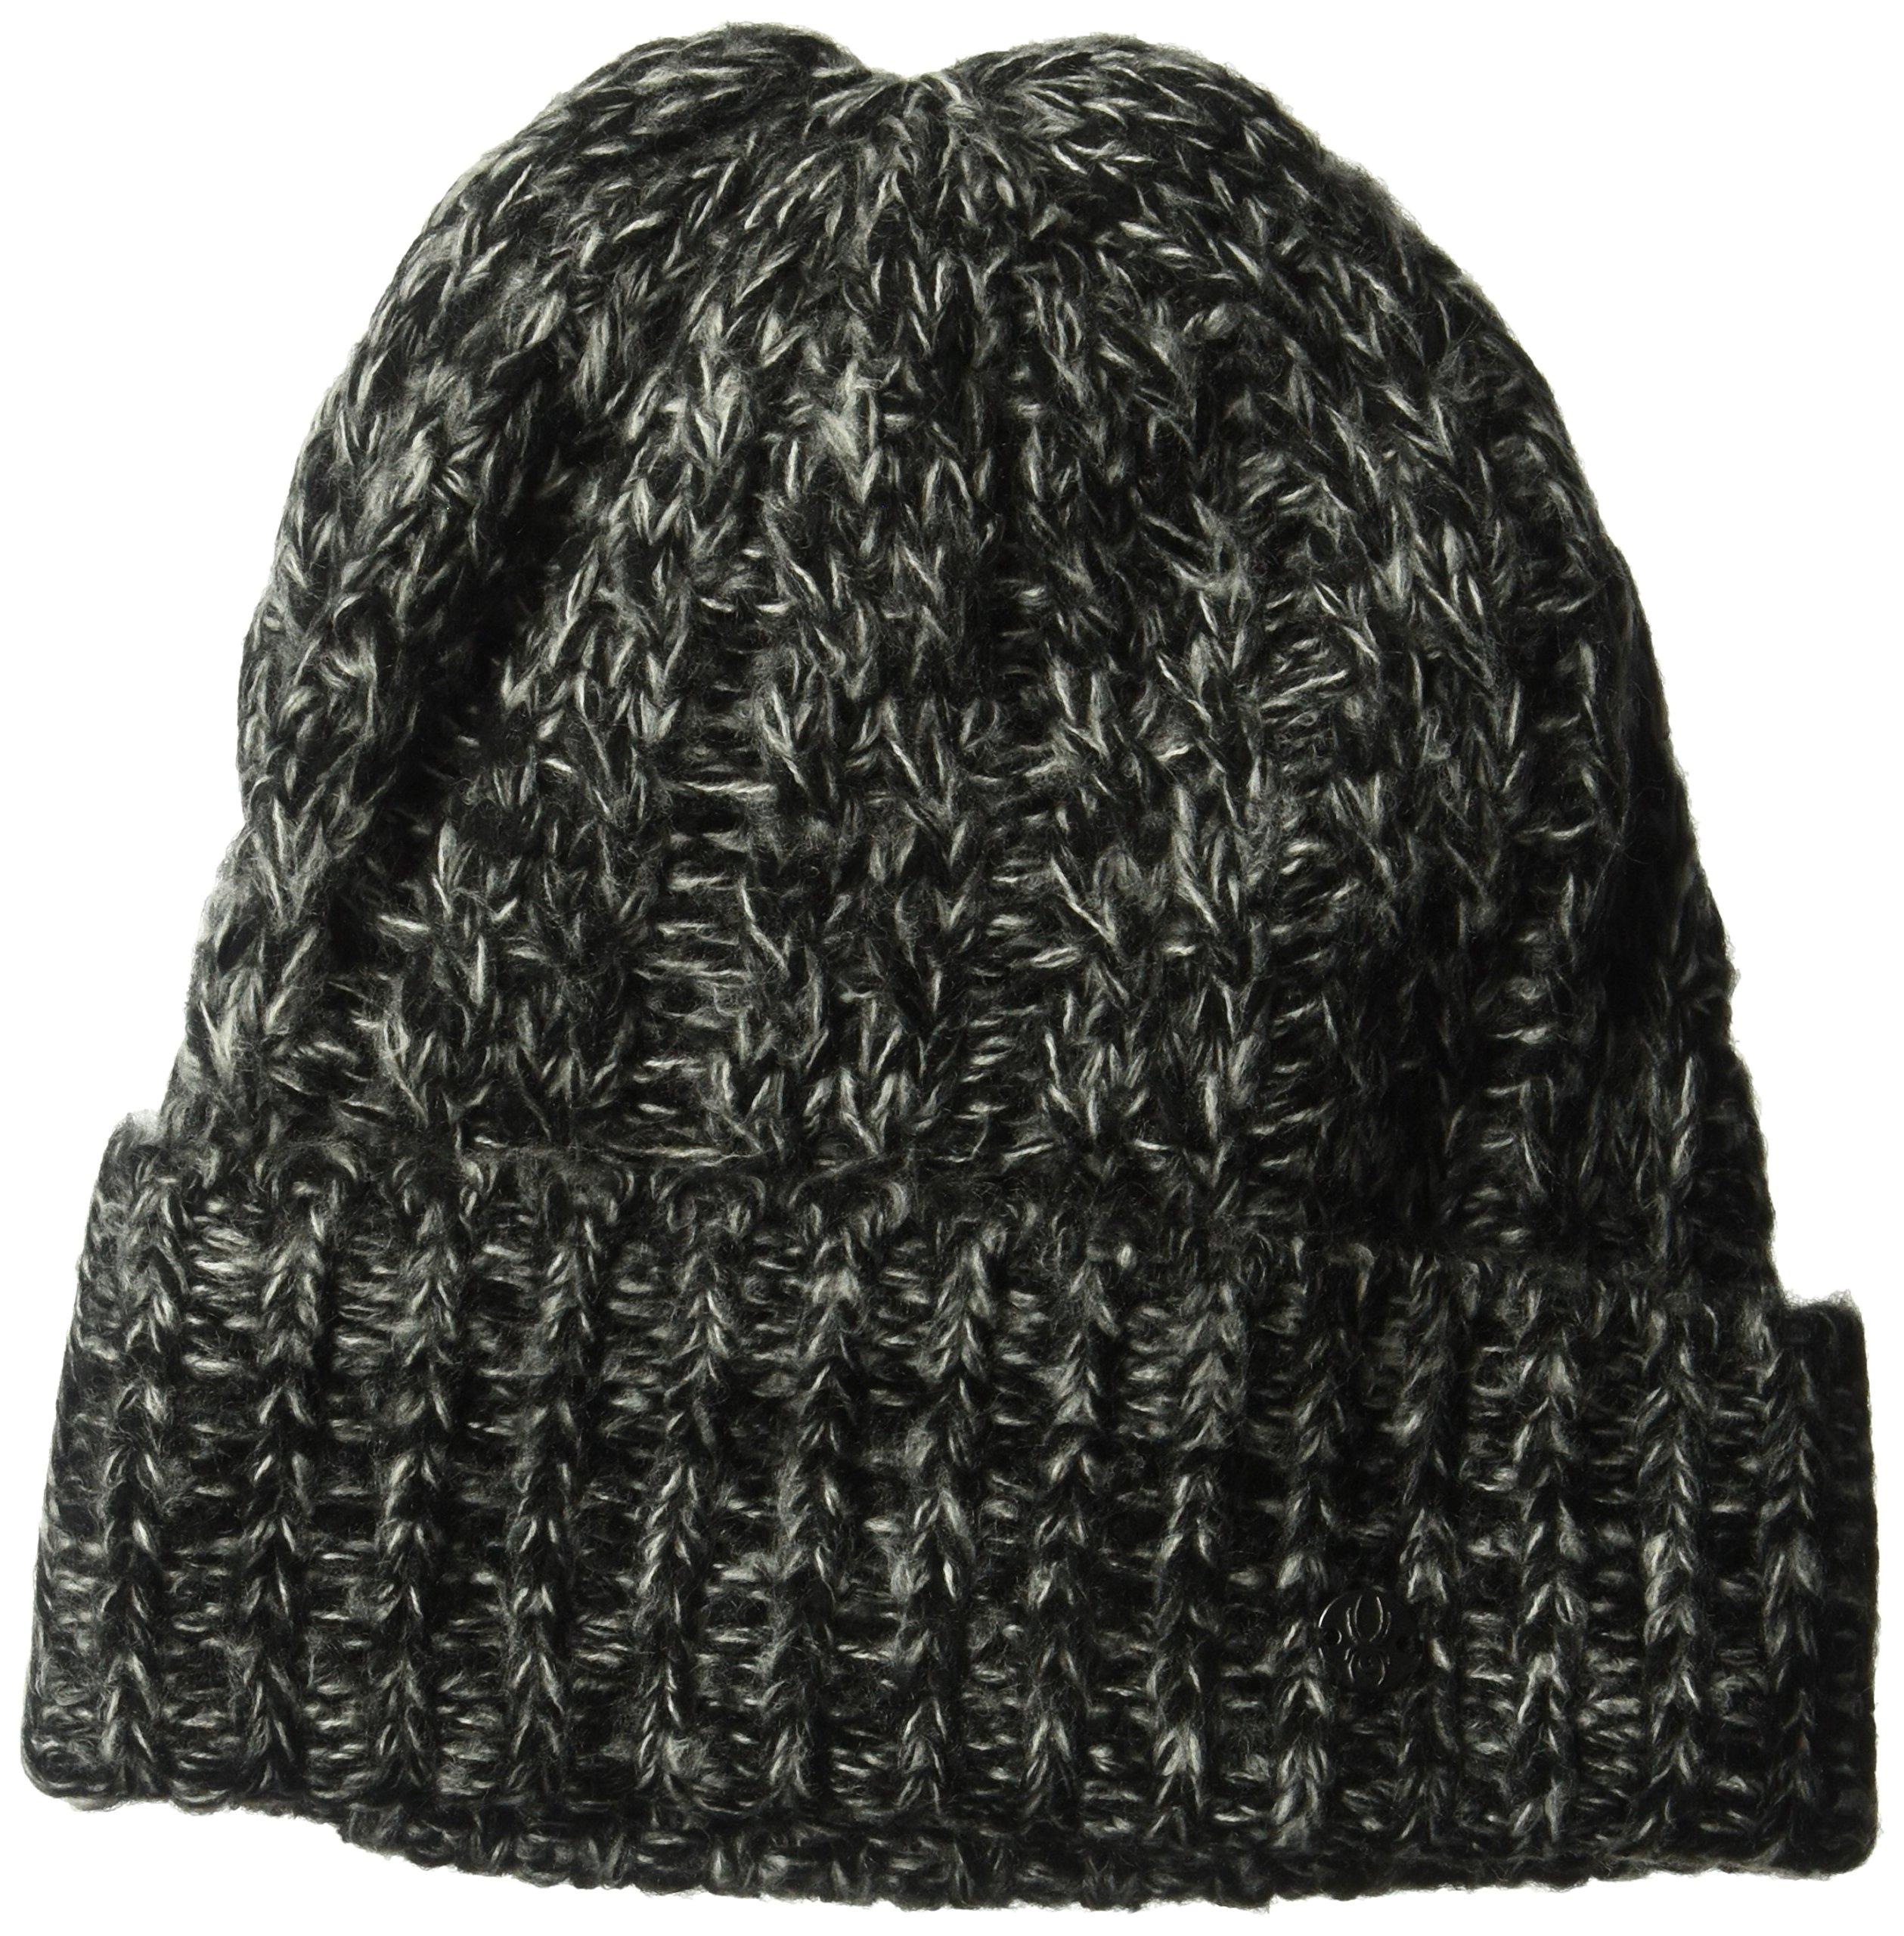 Spyder Women's Entwine Hat, Black/Marshmallow, One Size